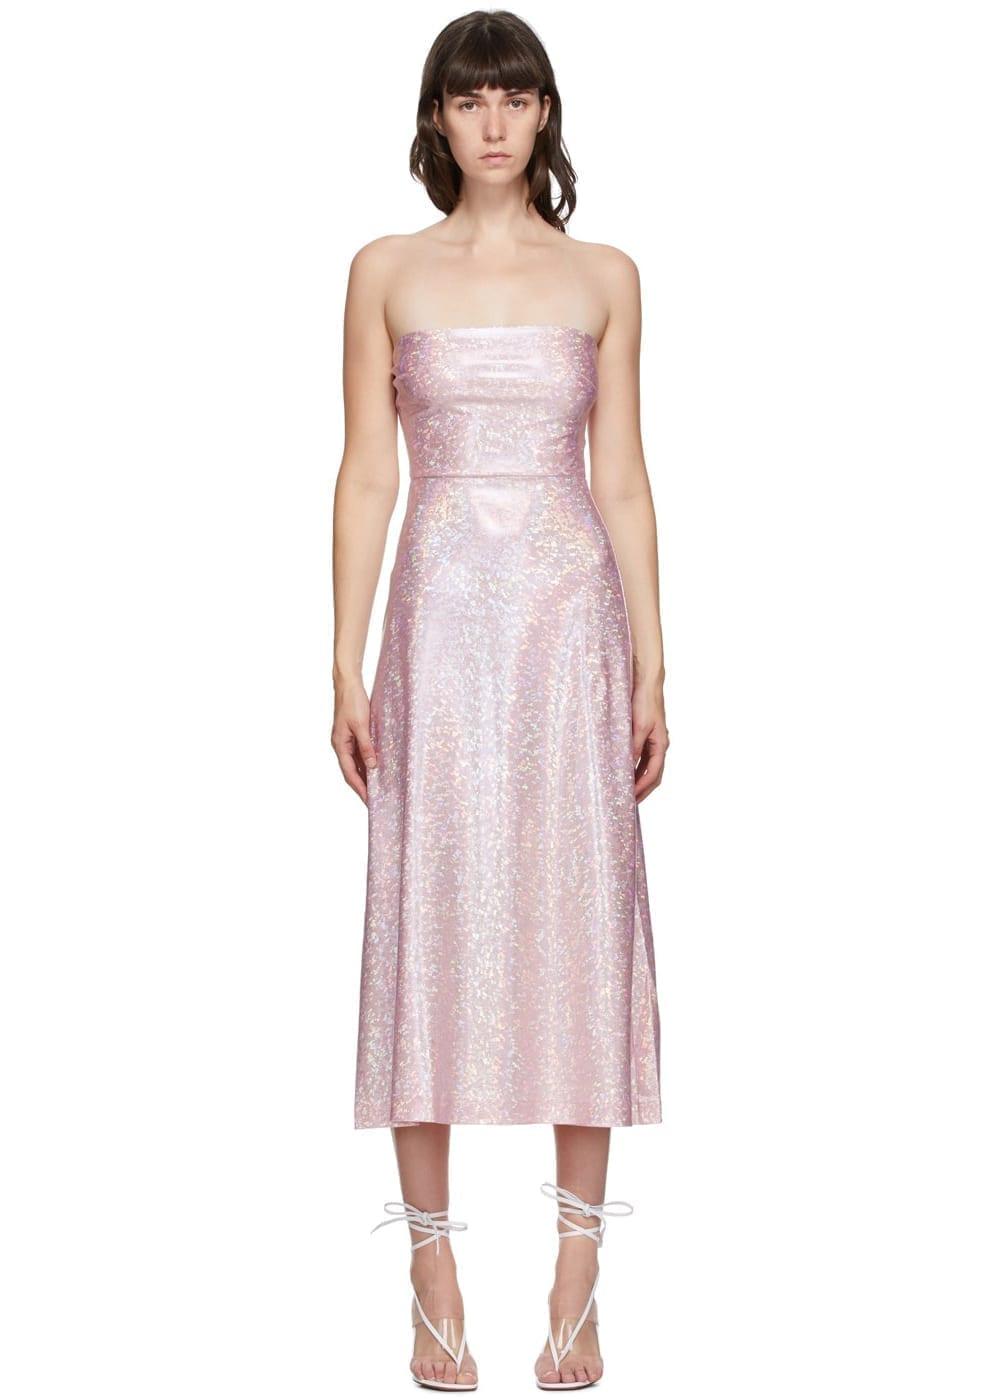 SAKS POTTS Pink Shimmer Jepska Dress